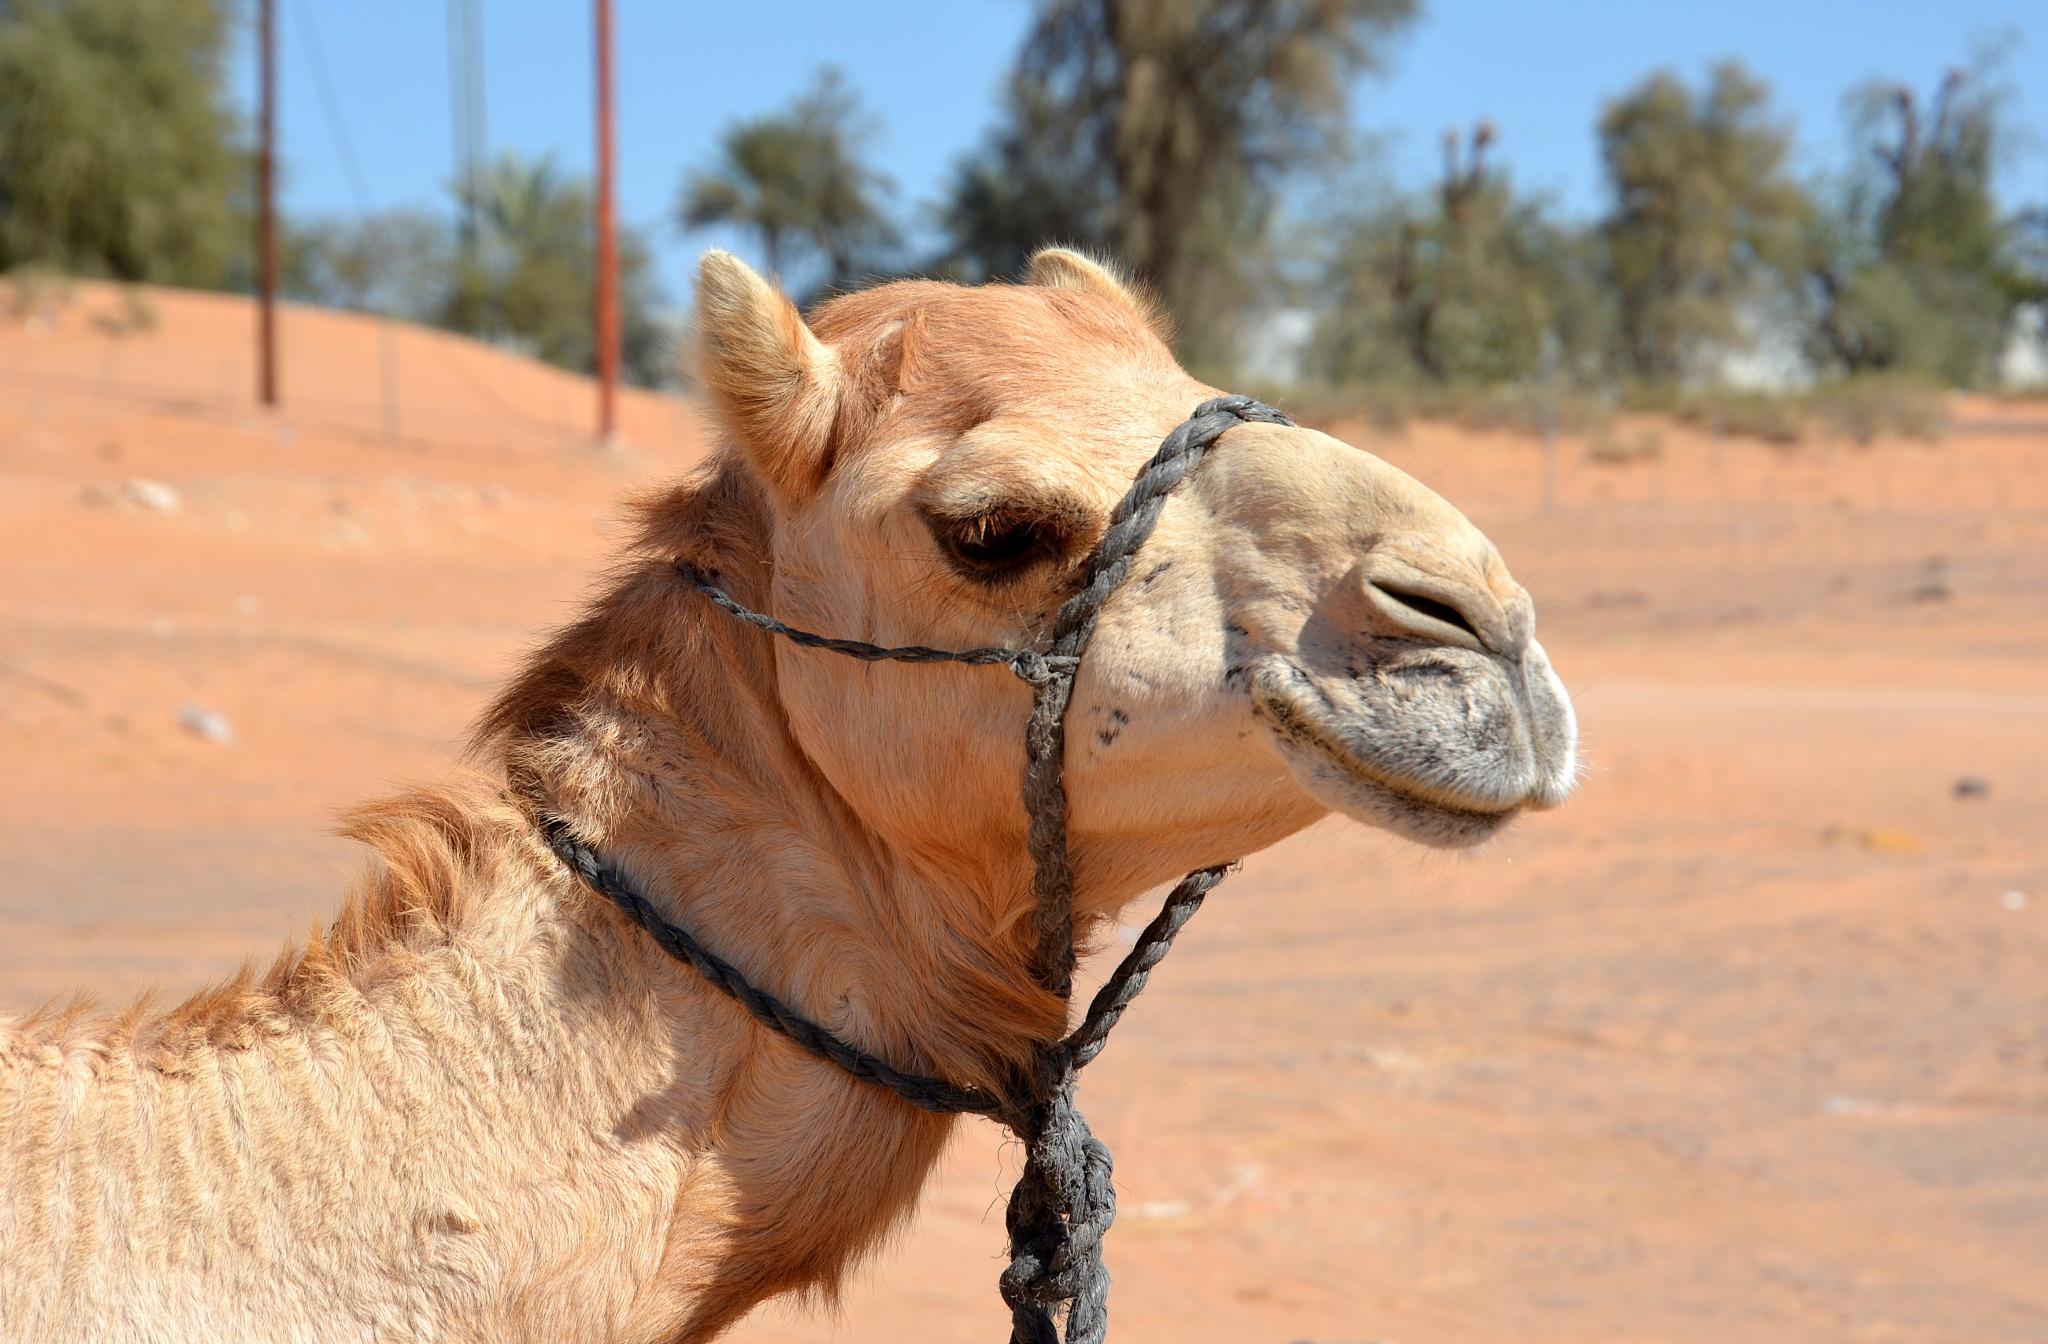 Camel by kelrey31